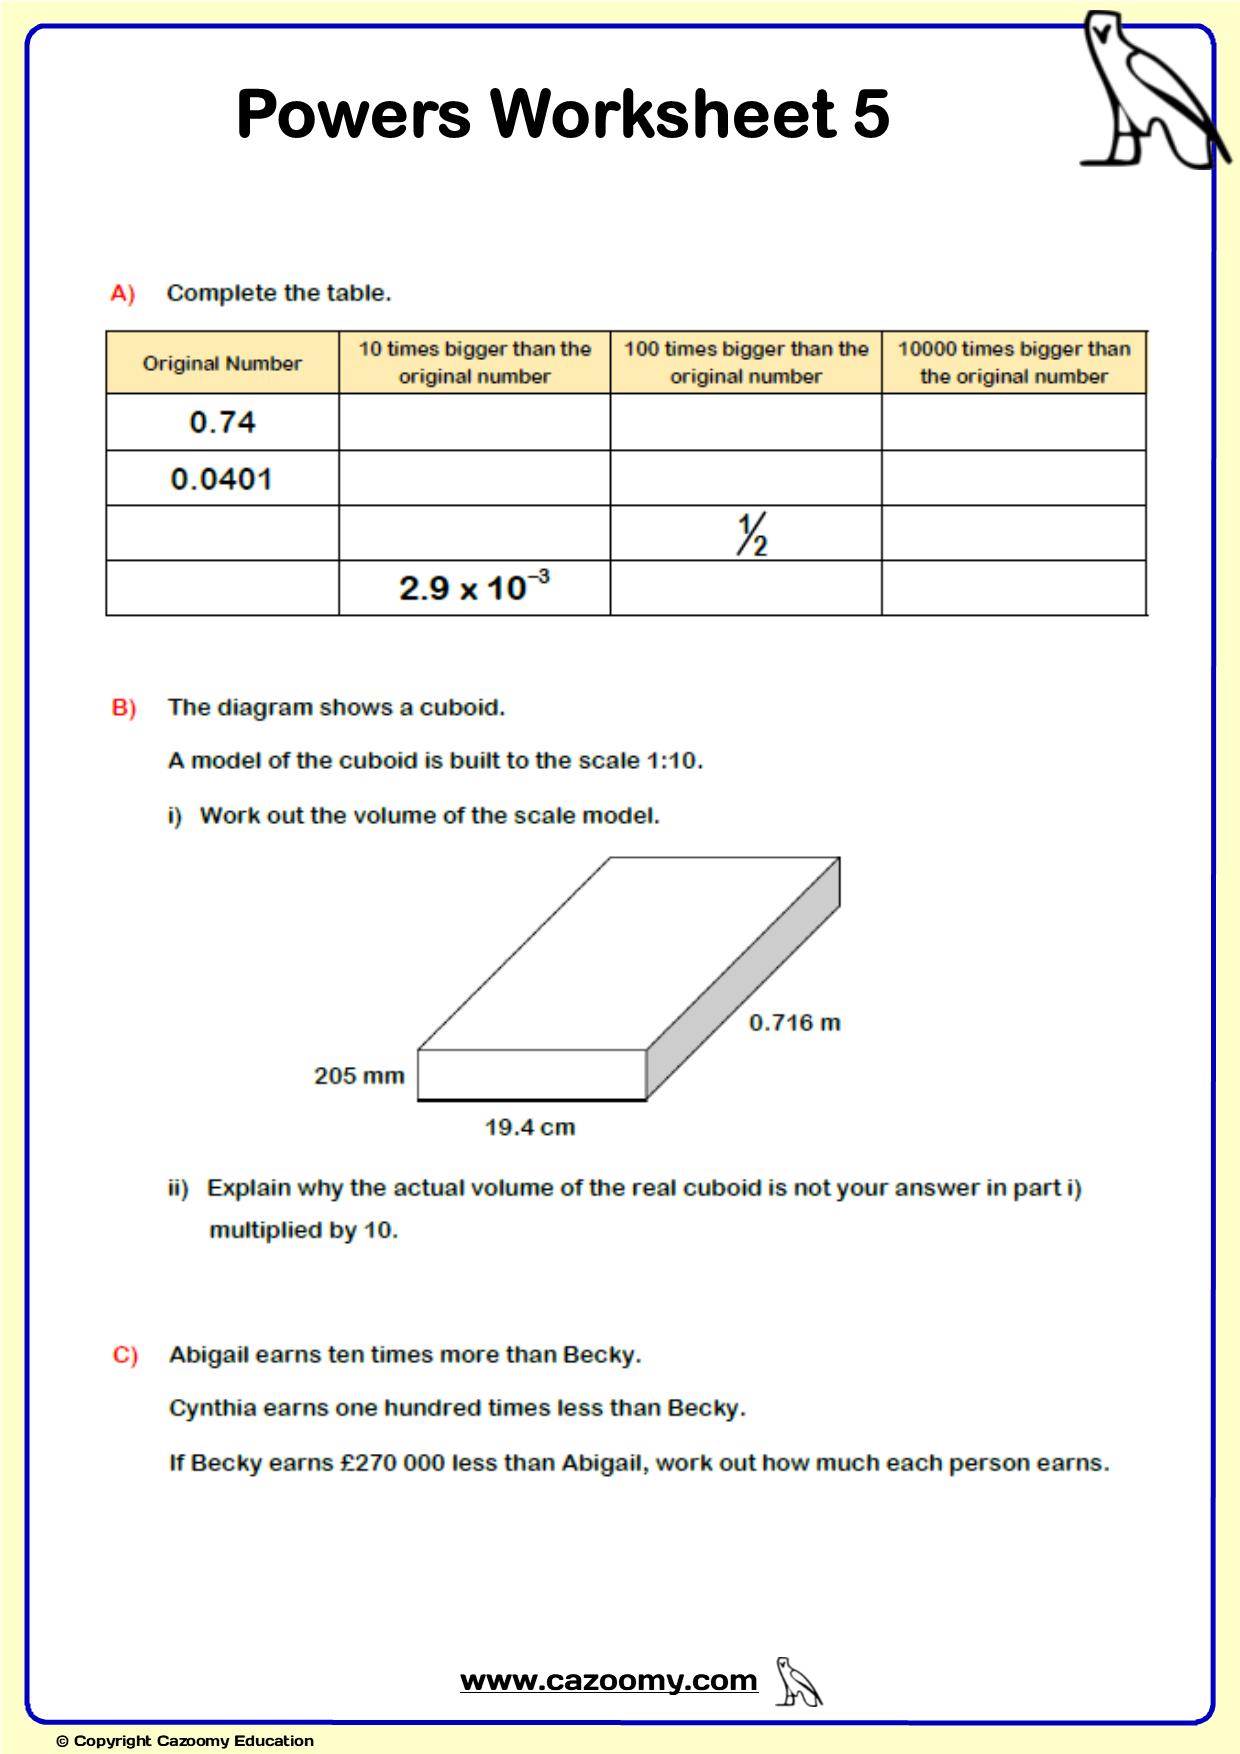 Powers Maths Worksheet 5